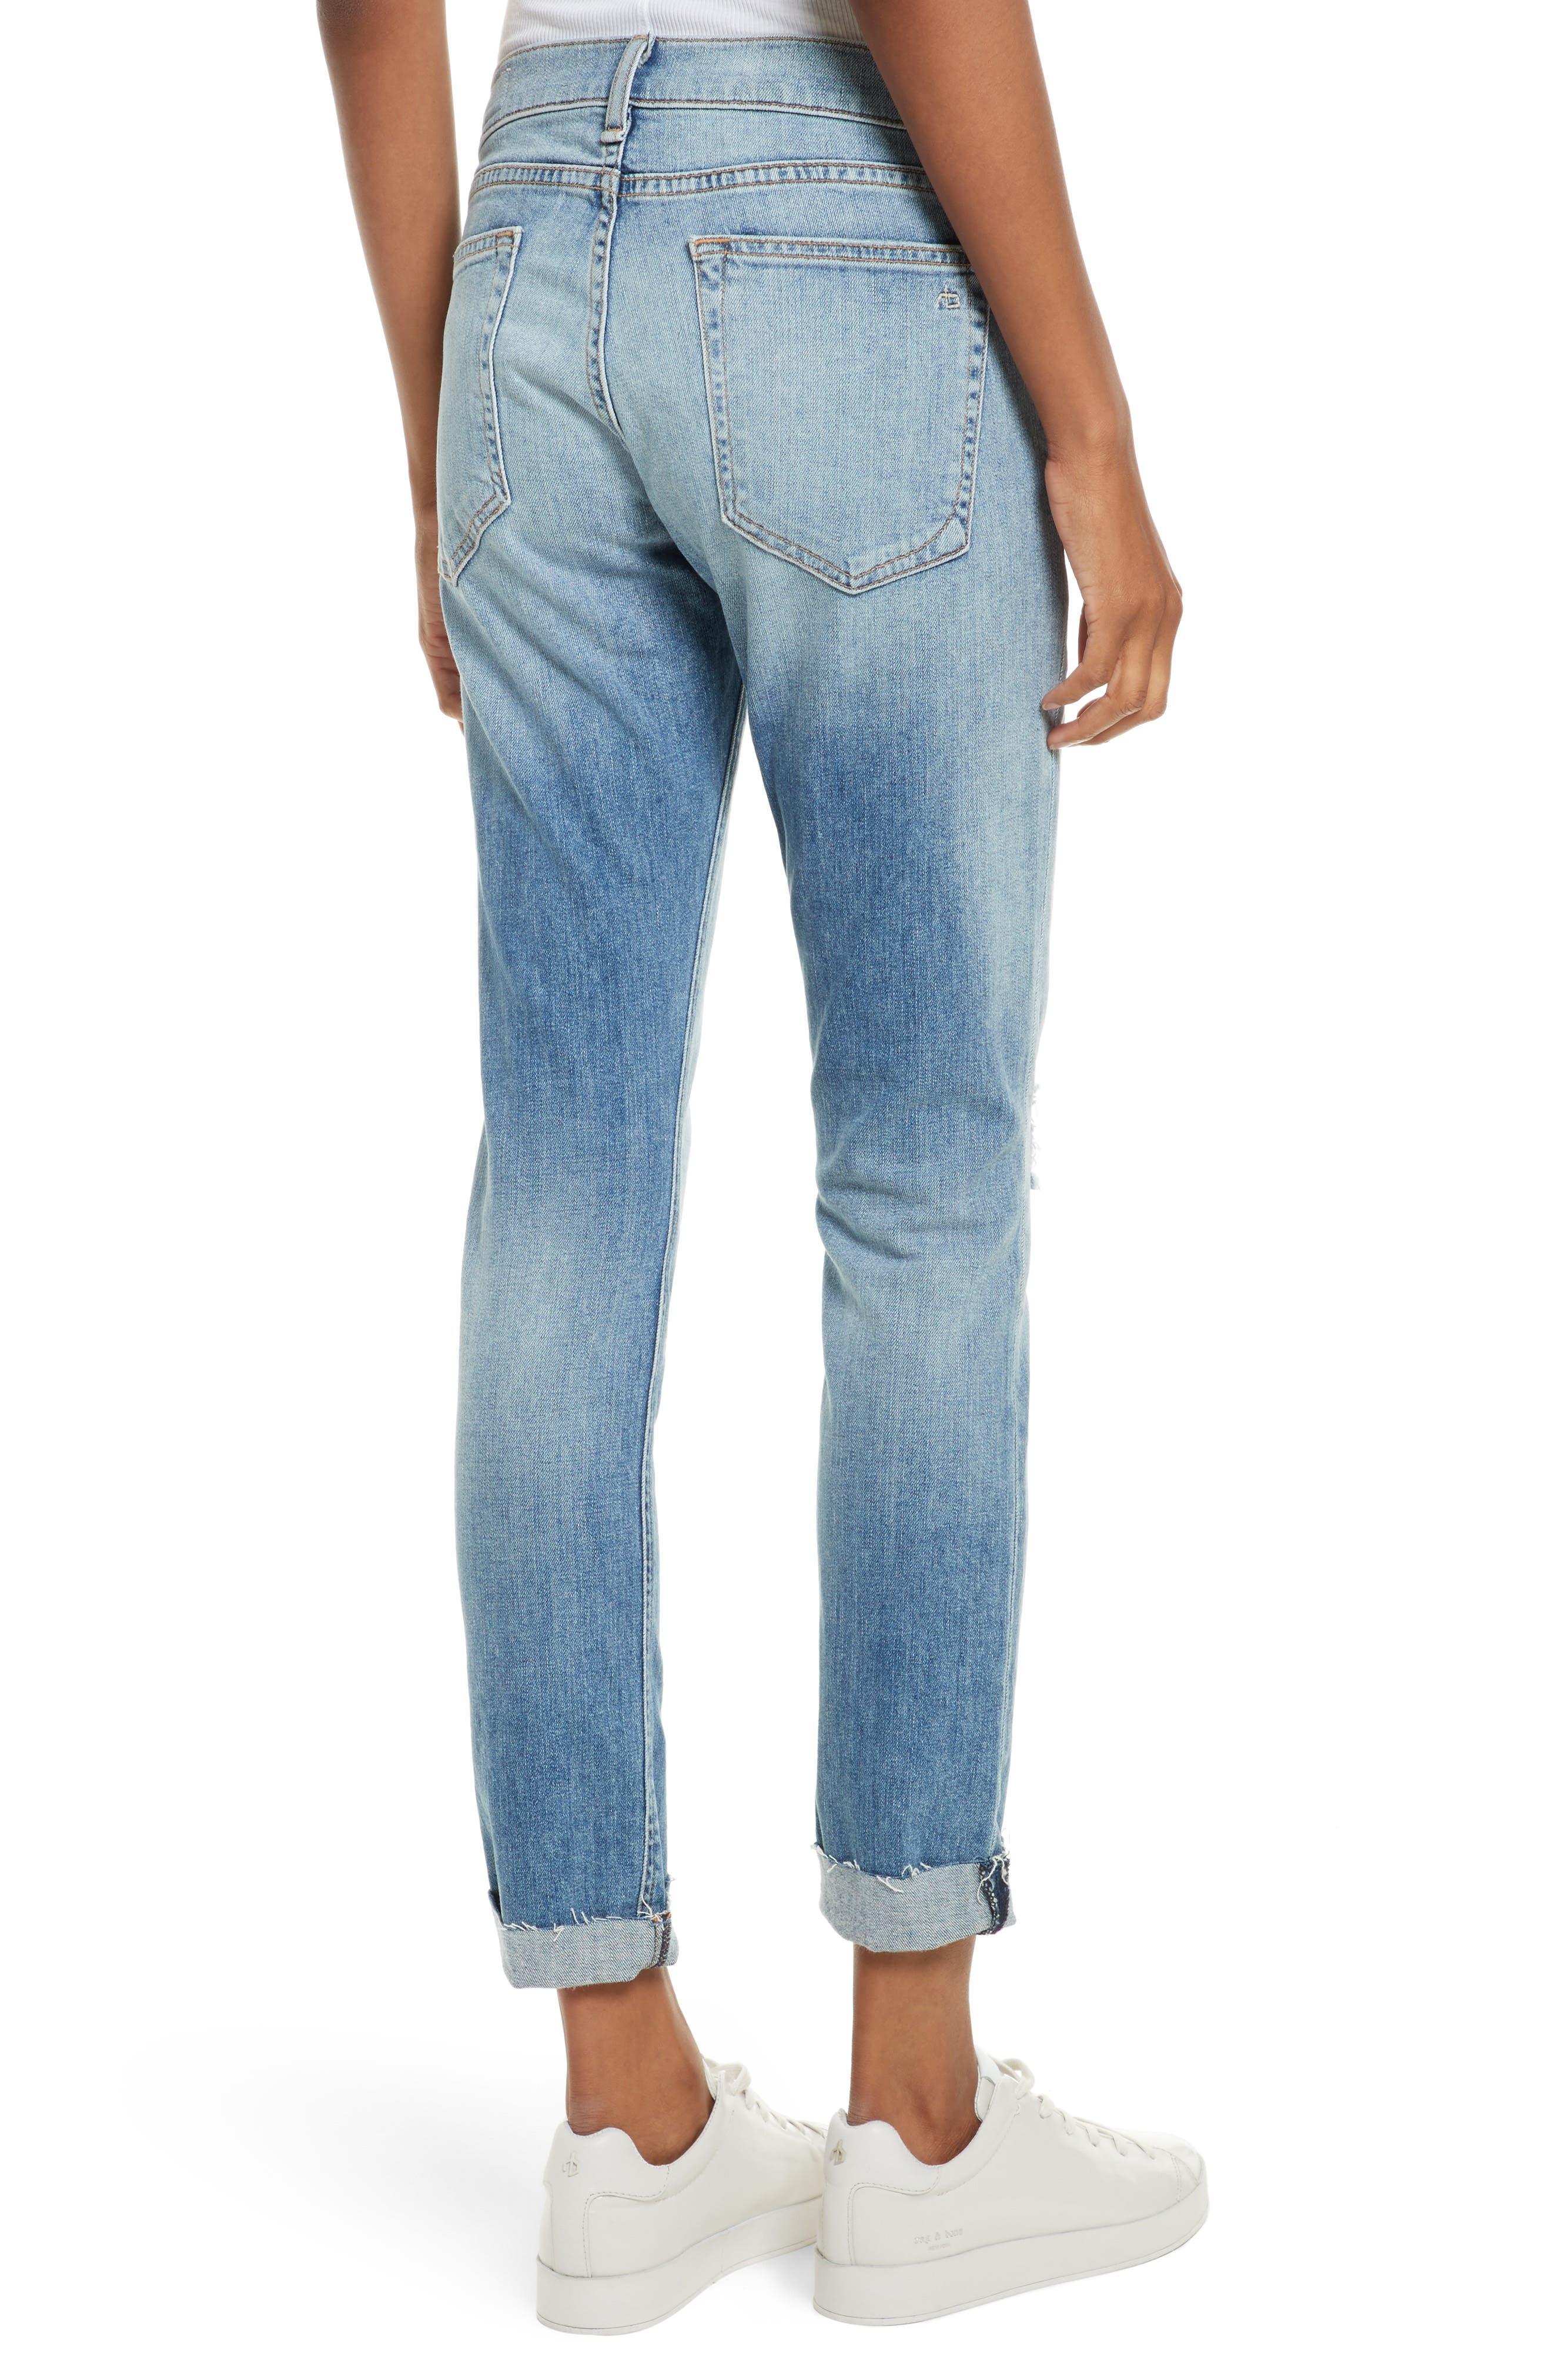 Alternate Image 2  - rag & bone/JEAN The Dre Slim Boyfriend Jeans (June)